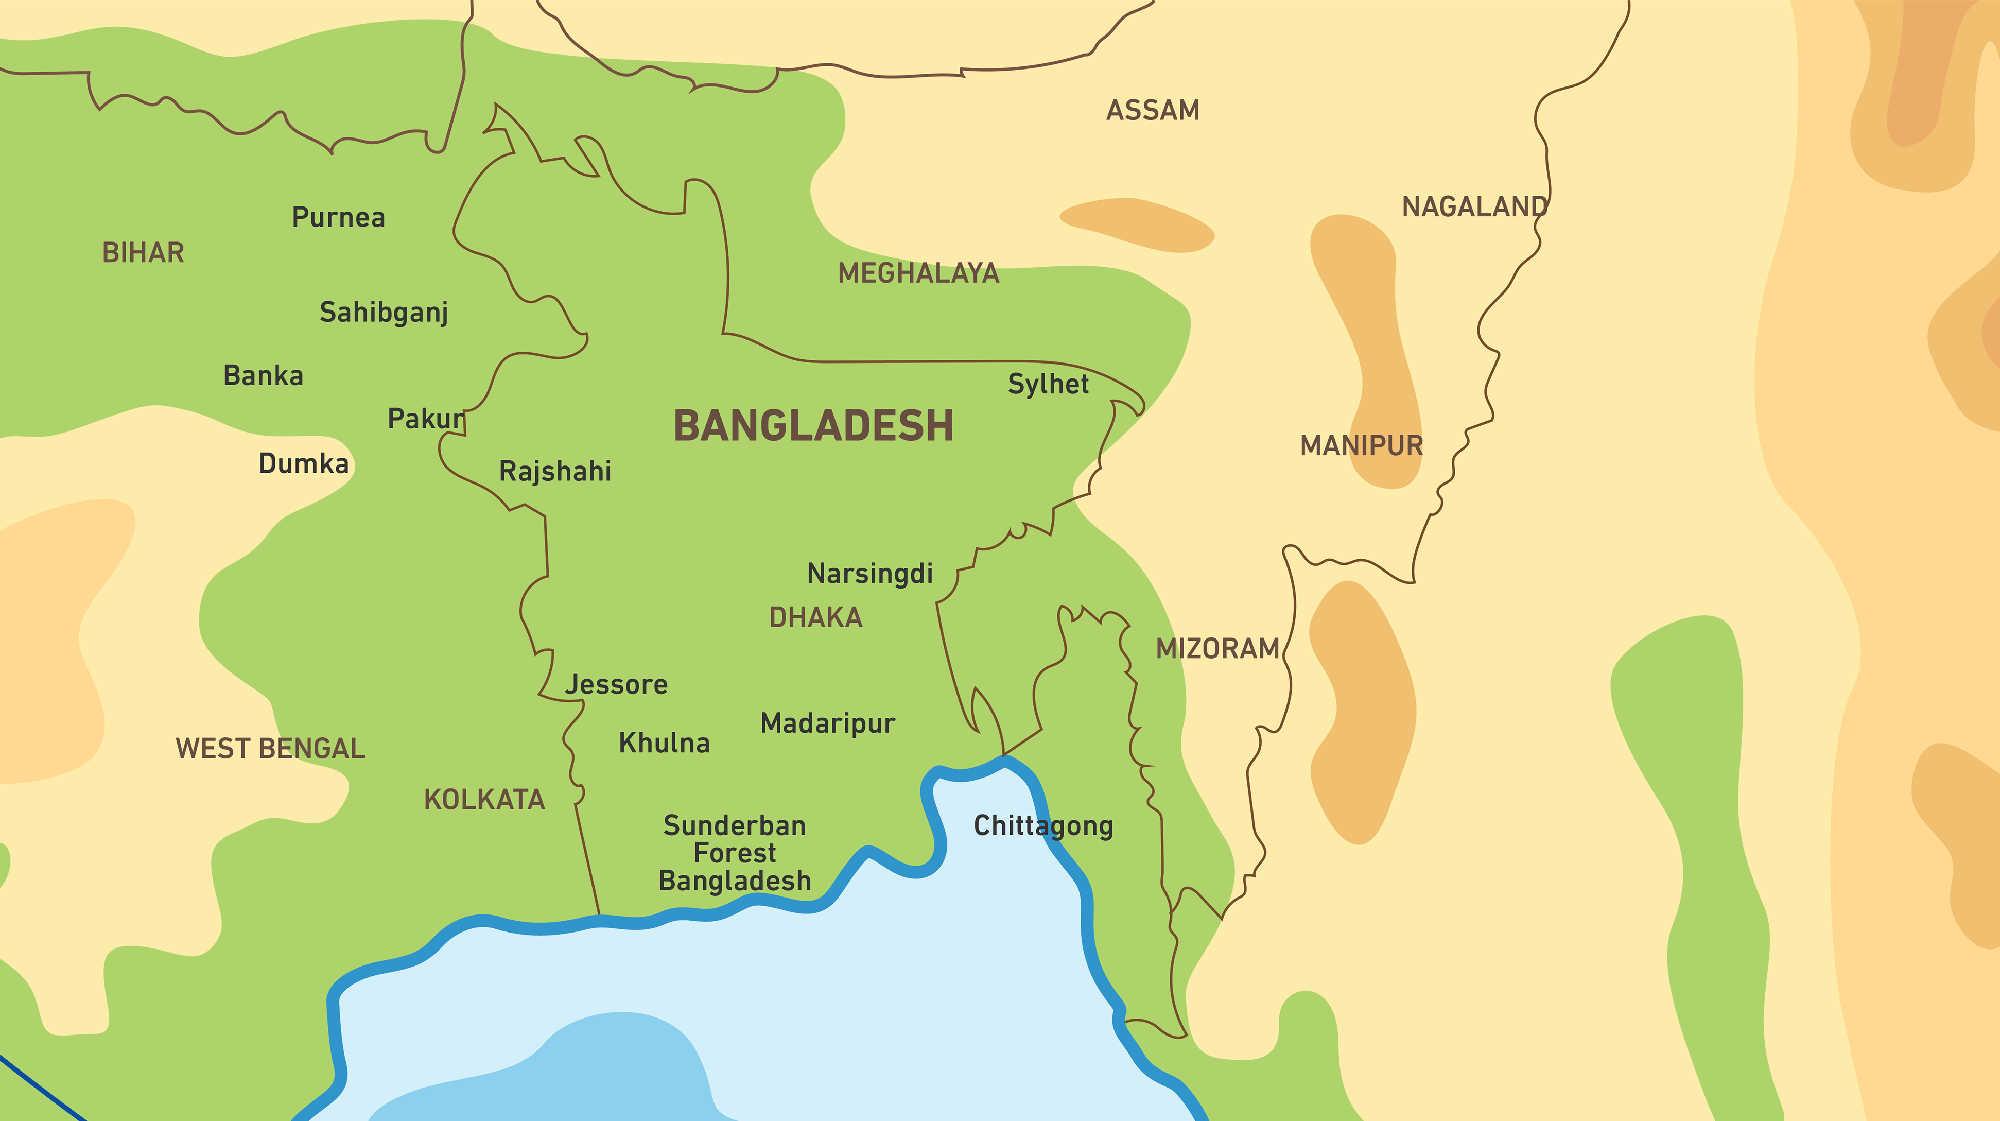 Map of Kacific 1 sattellite coverage of Bangladesh